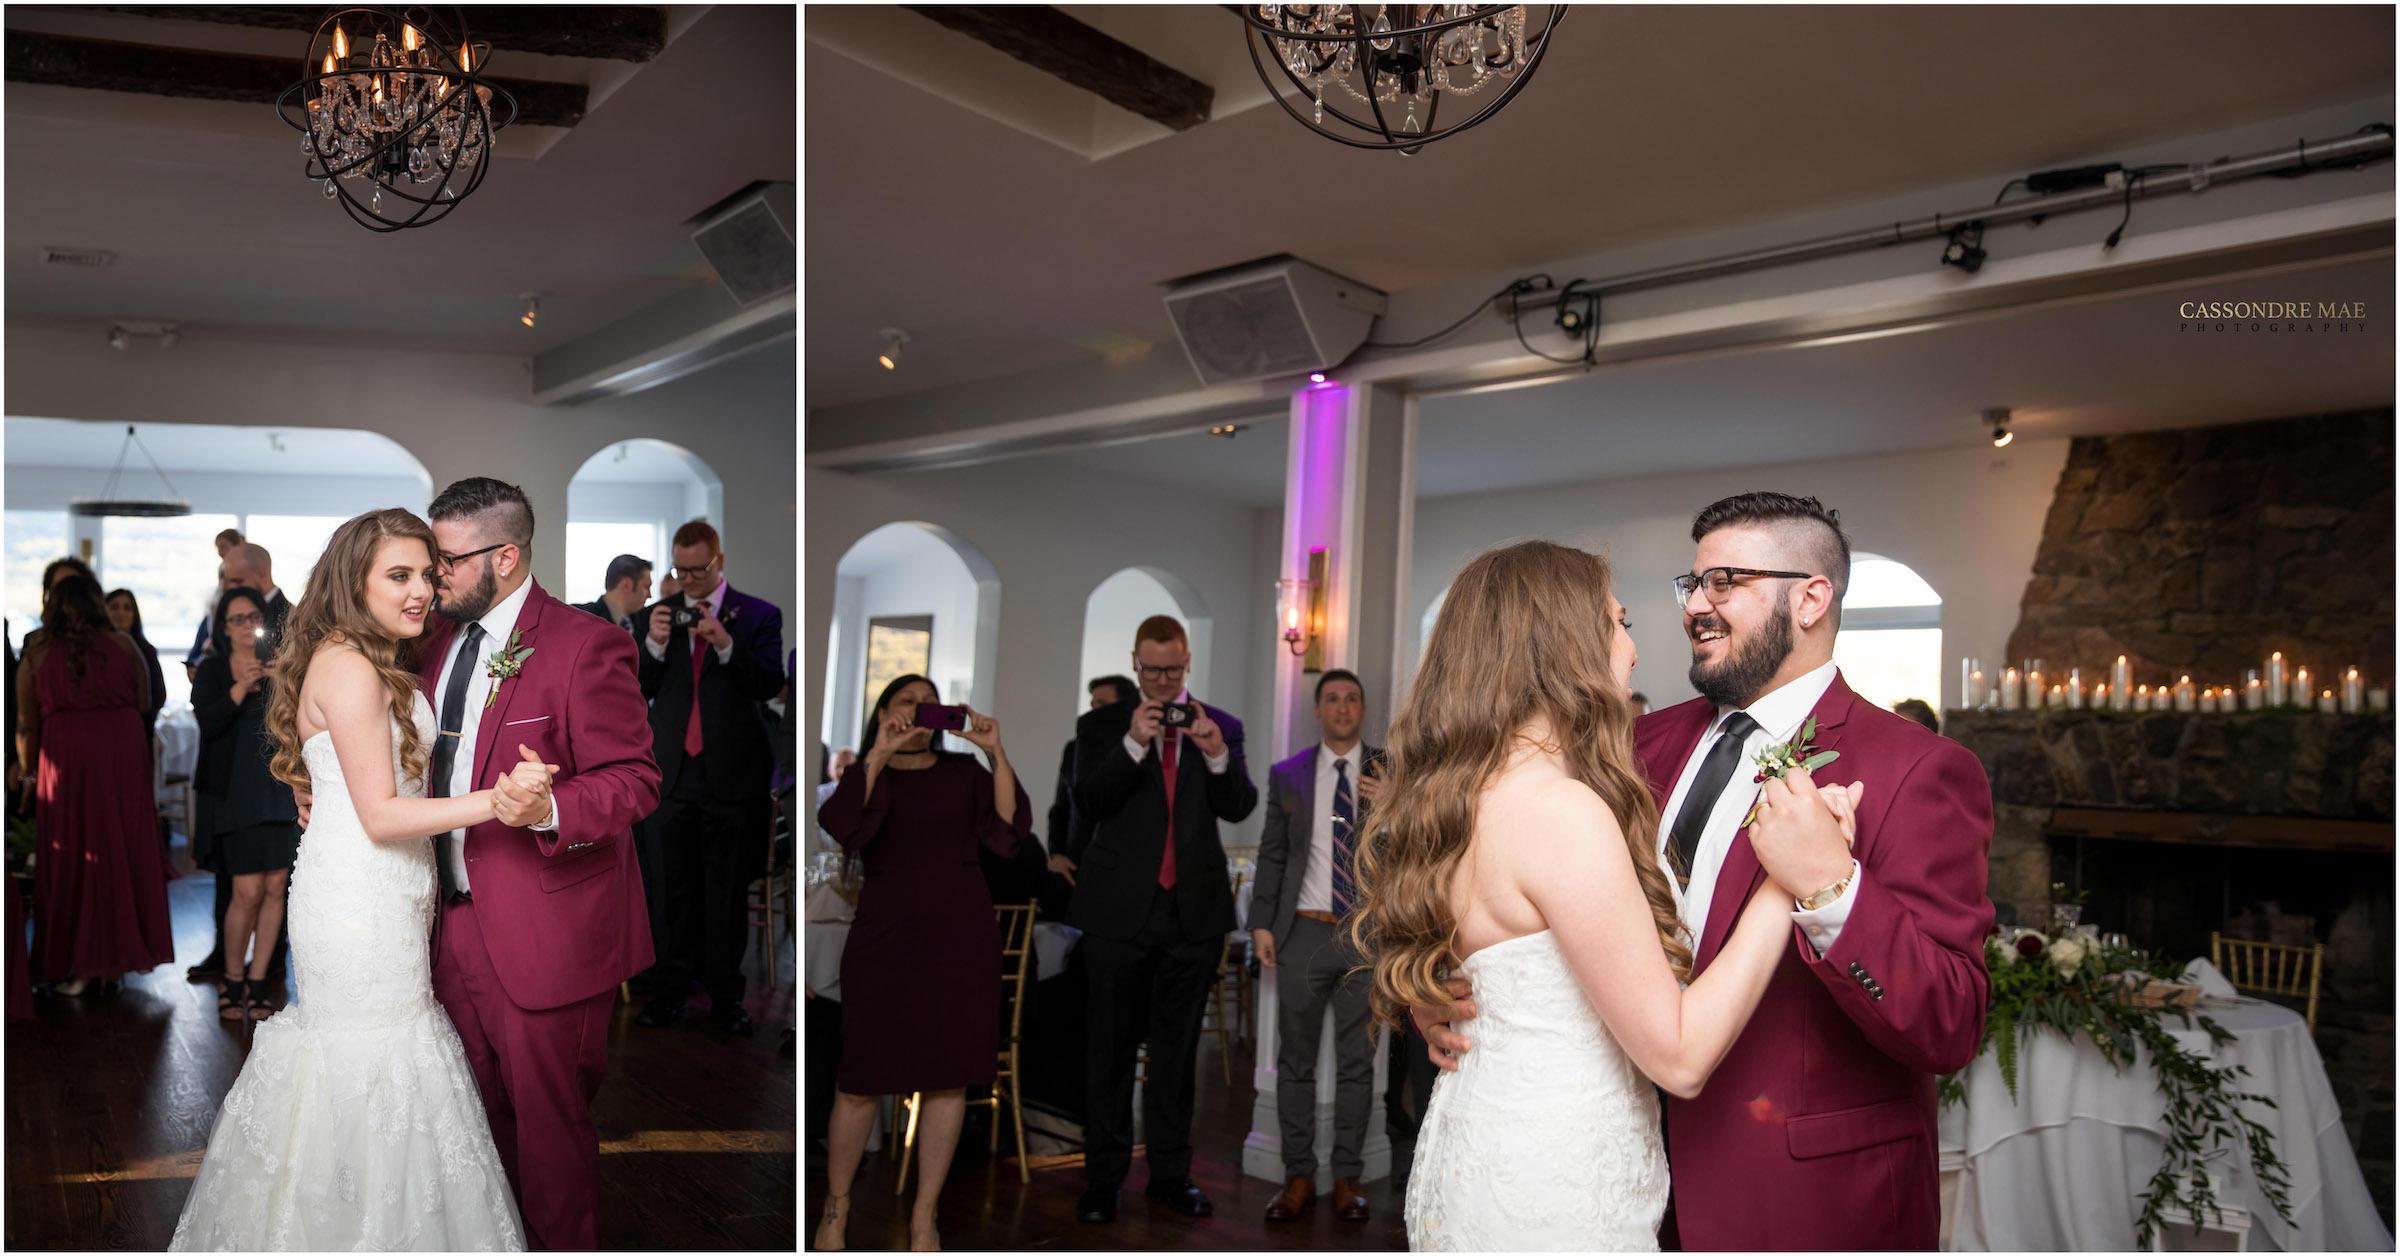 Cassondre Mae Photography Cove Castle Weddings 22.jpg